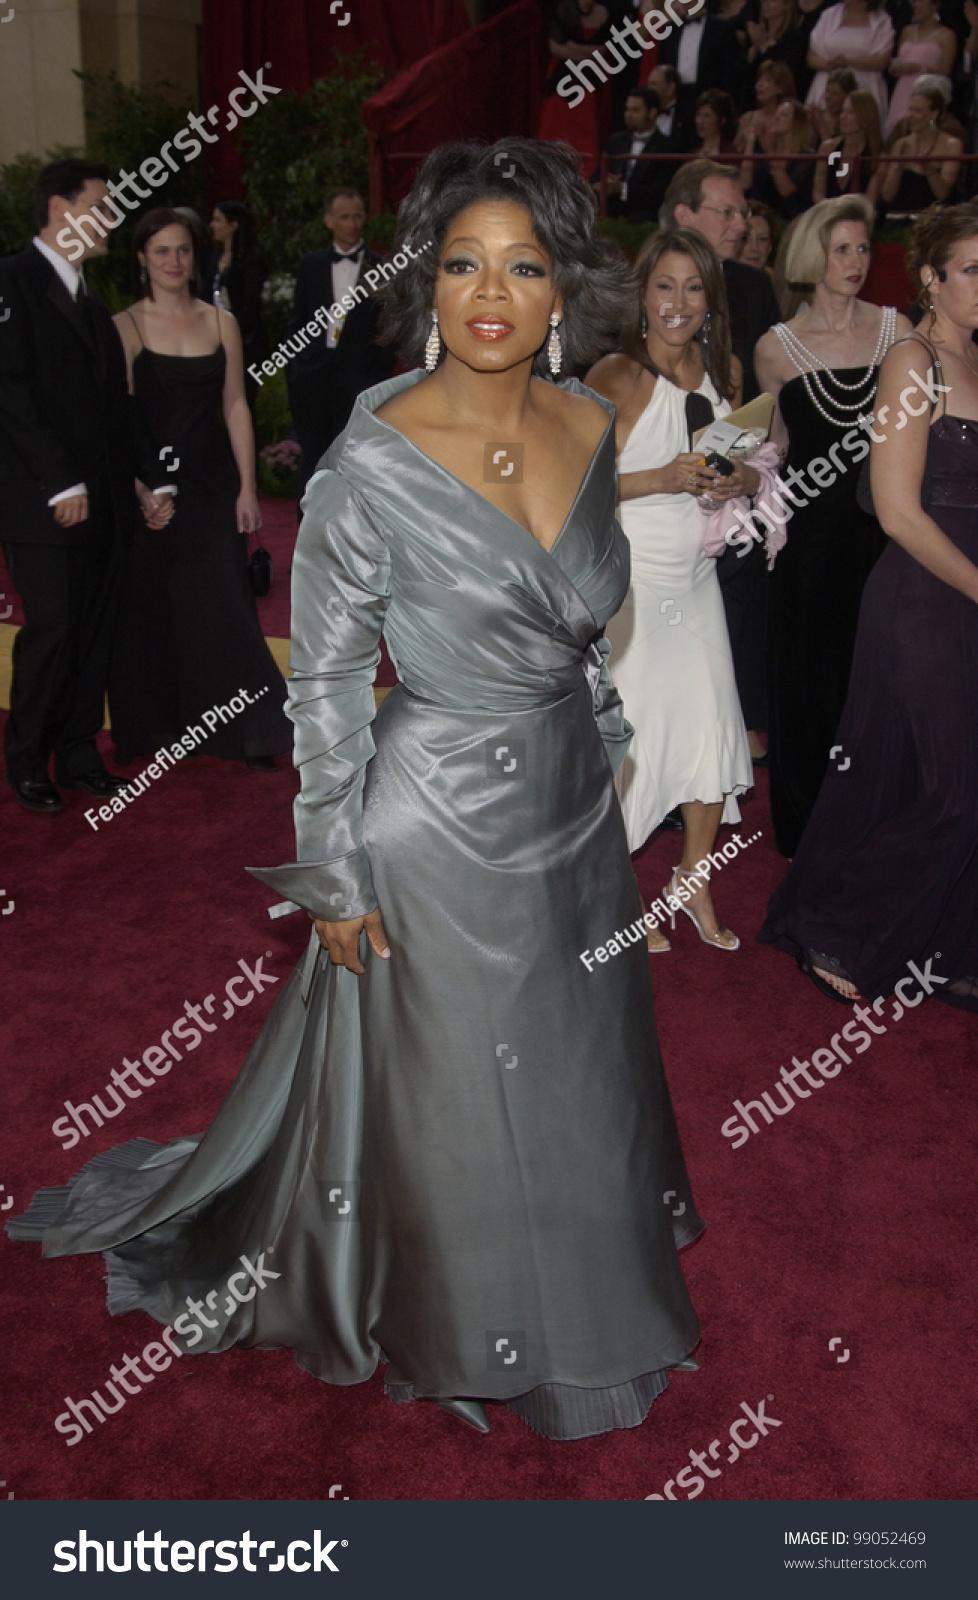 Oprah's Gray Gown